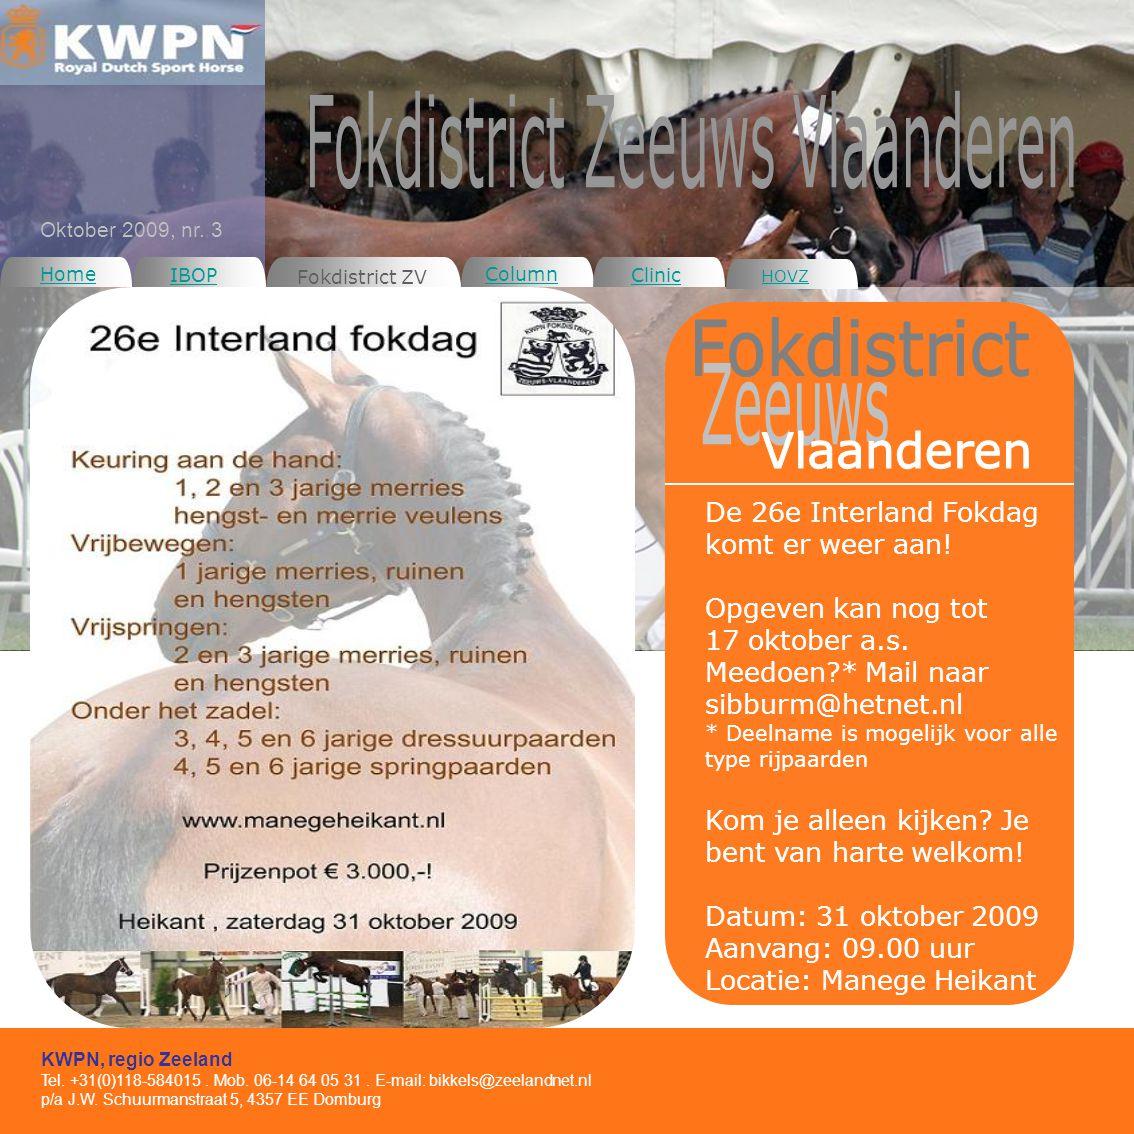 Column Clinic KWPN, regio Zeeland Tel. +31(0)118-584015.